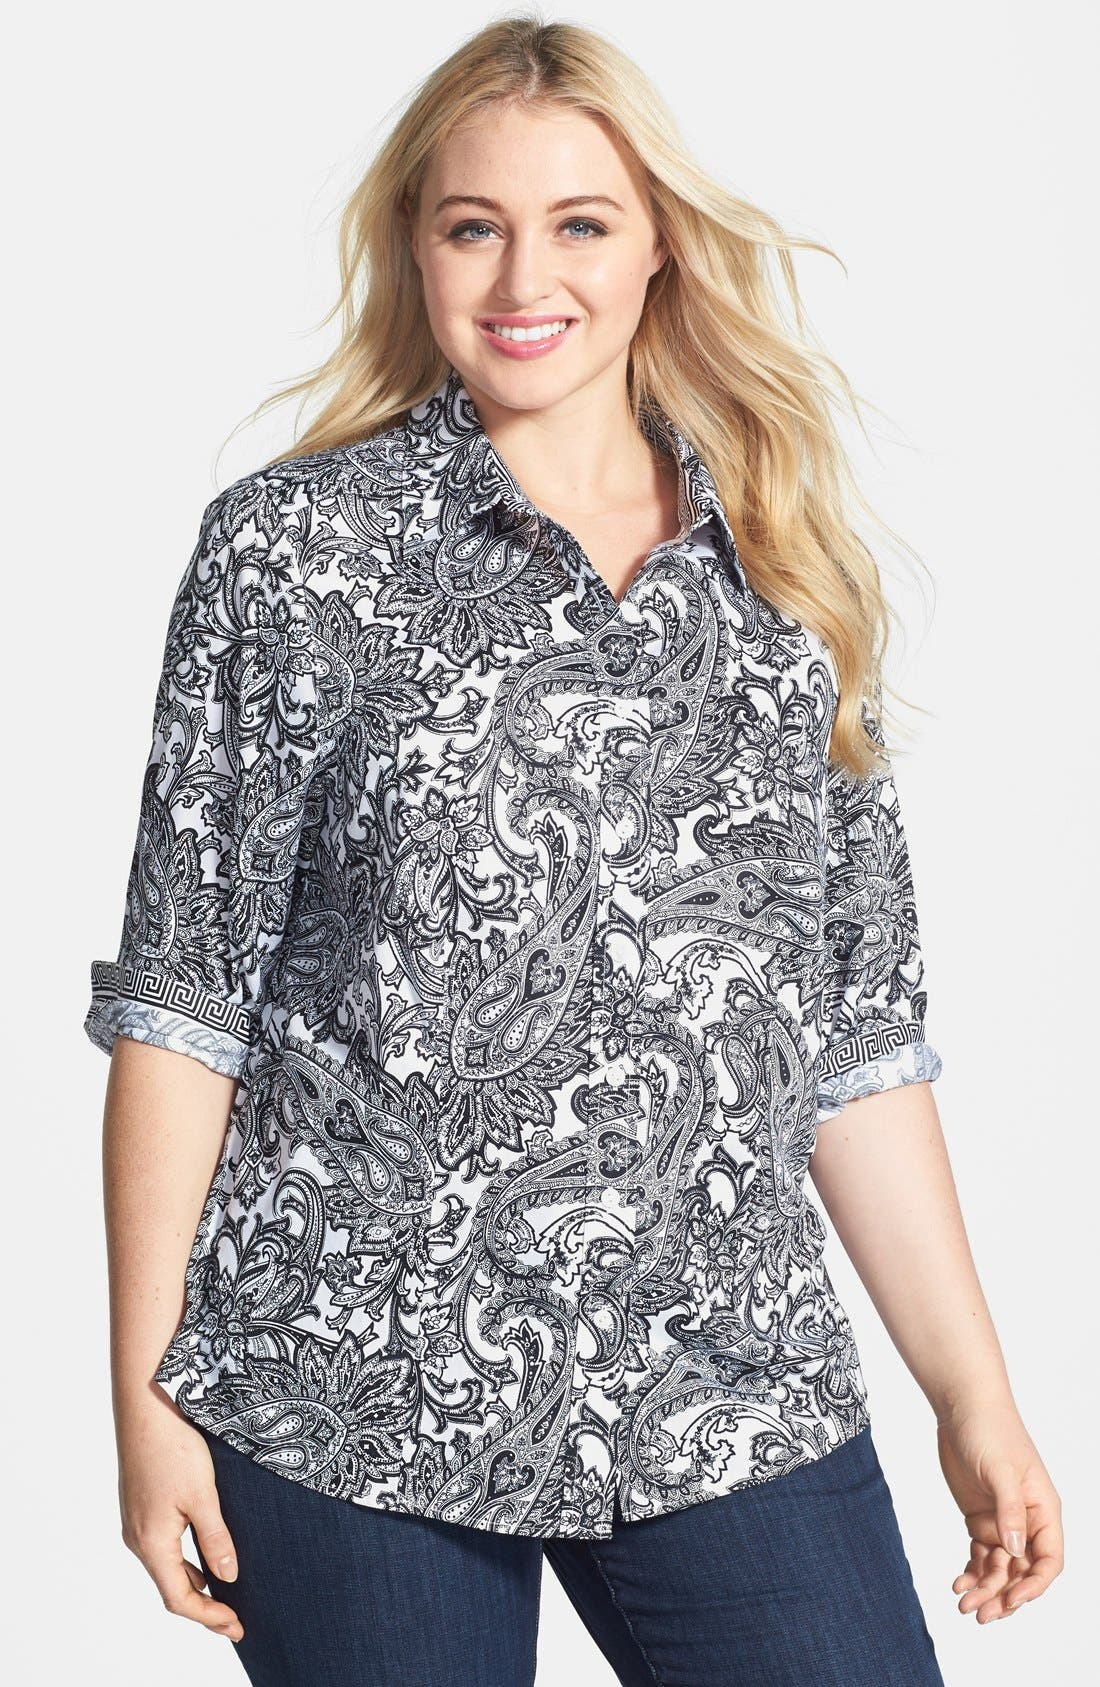 Main Image - Foxcroft 'Santorini' Paisley Print Wrinkle Free Cotton Shirt (Plus Size)